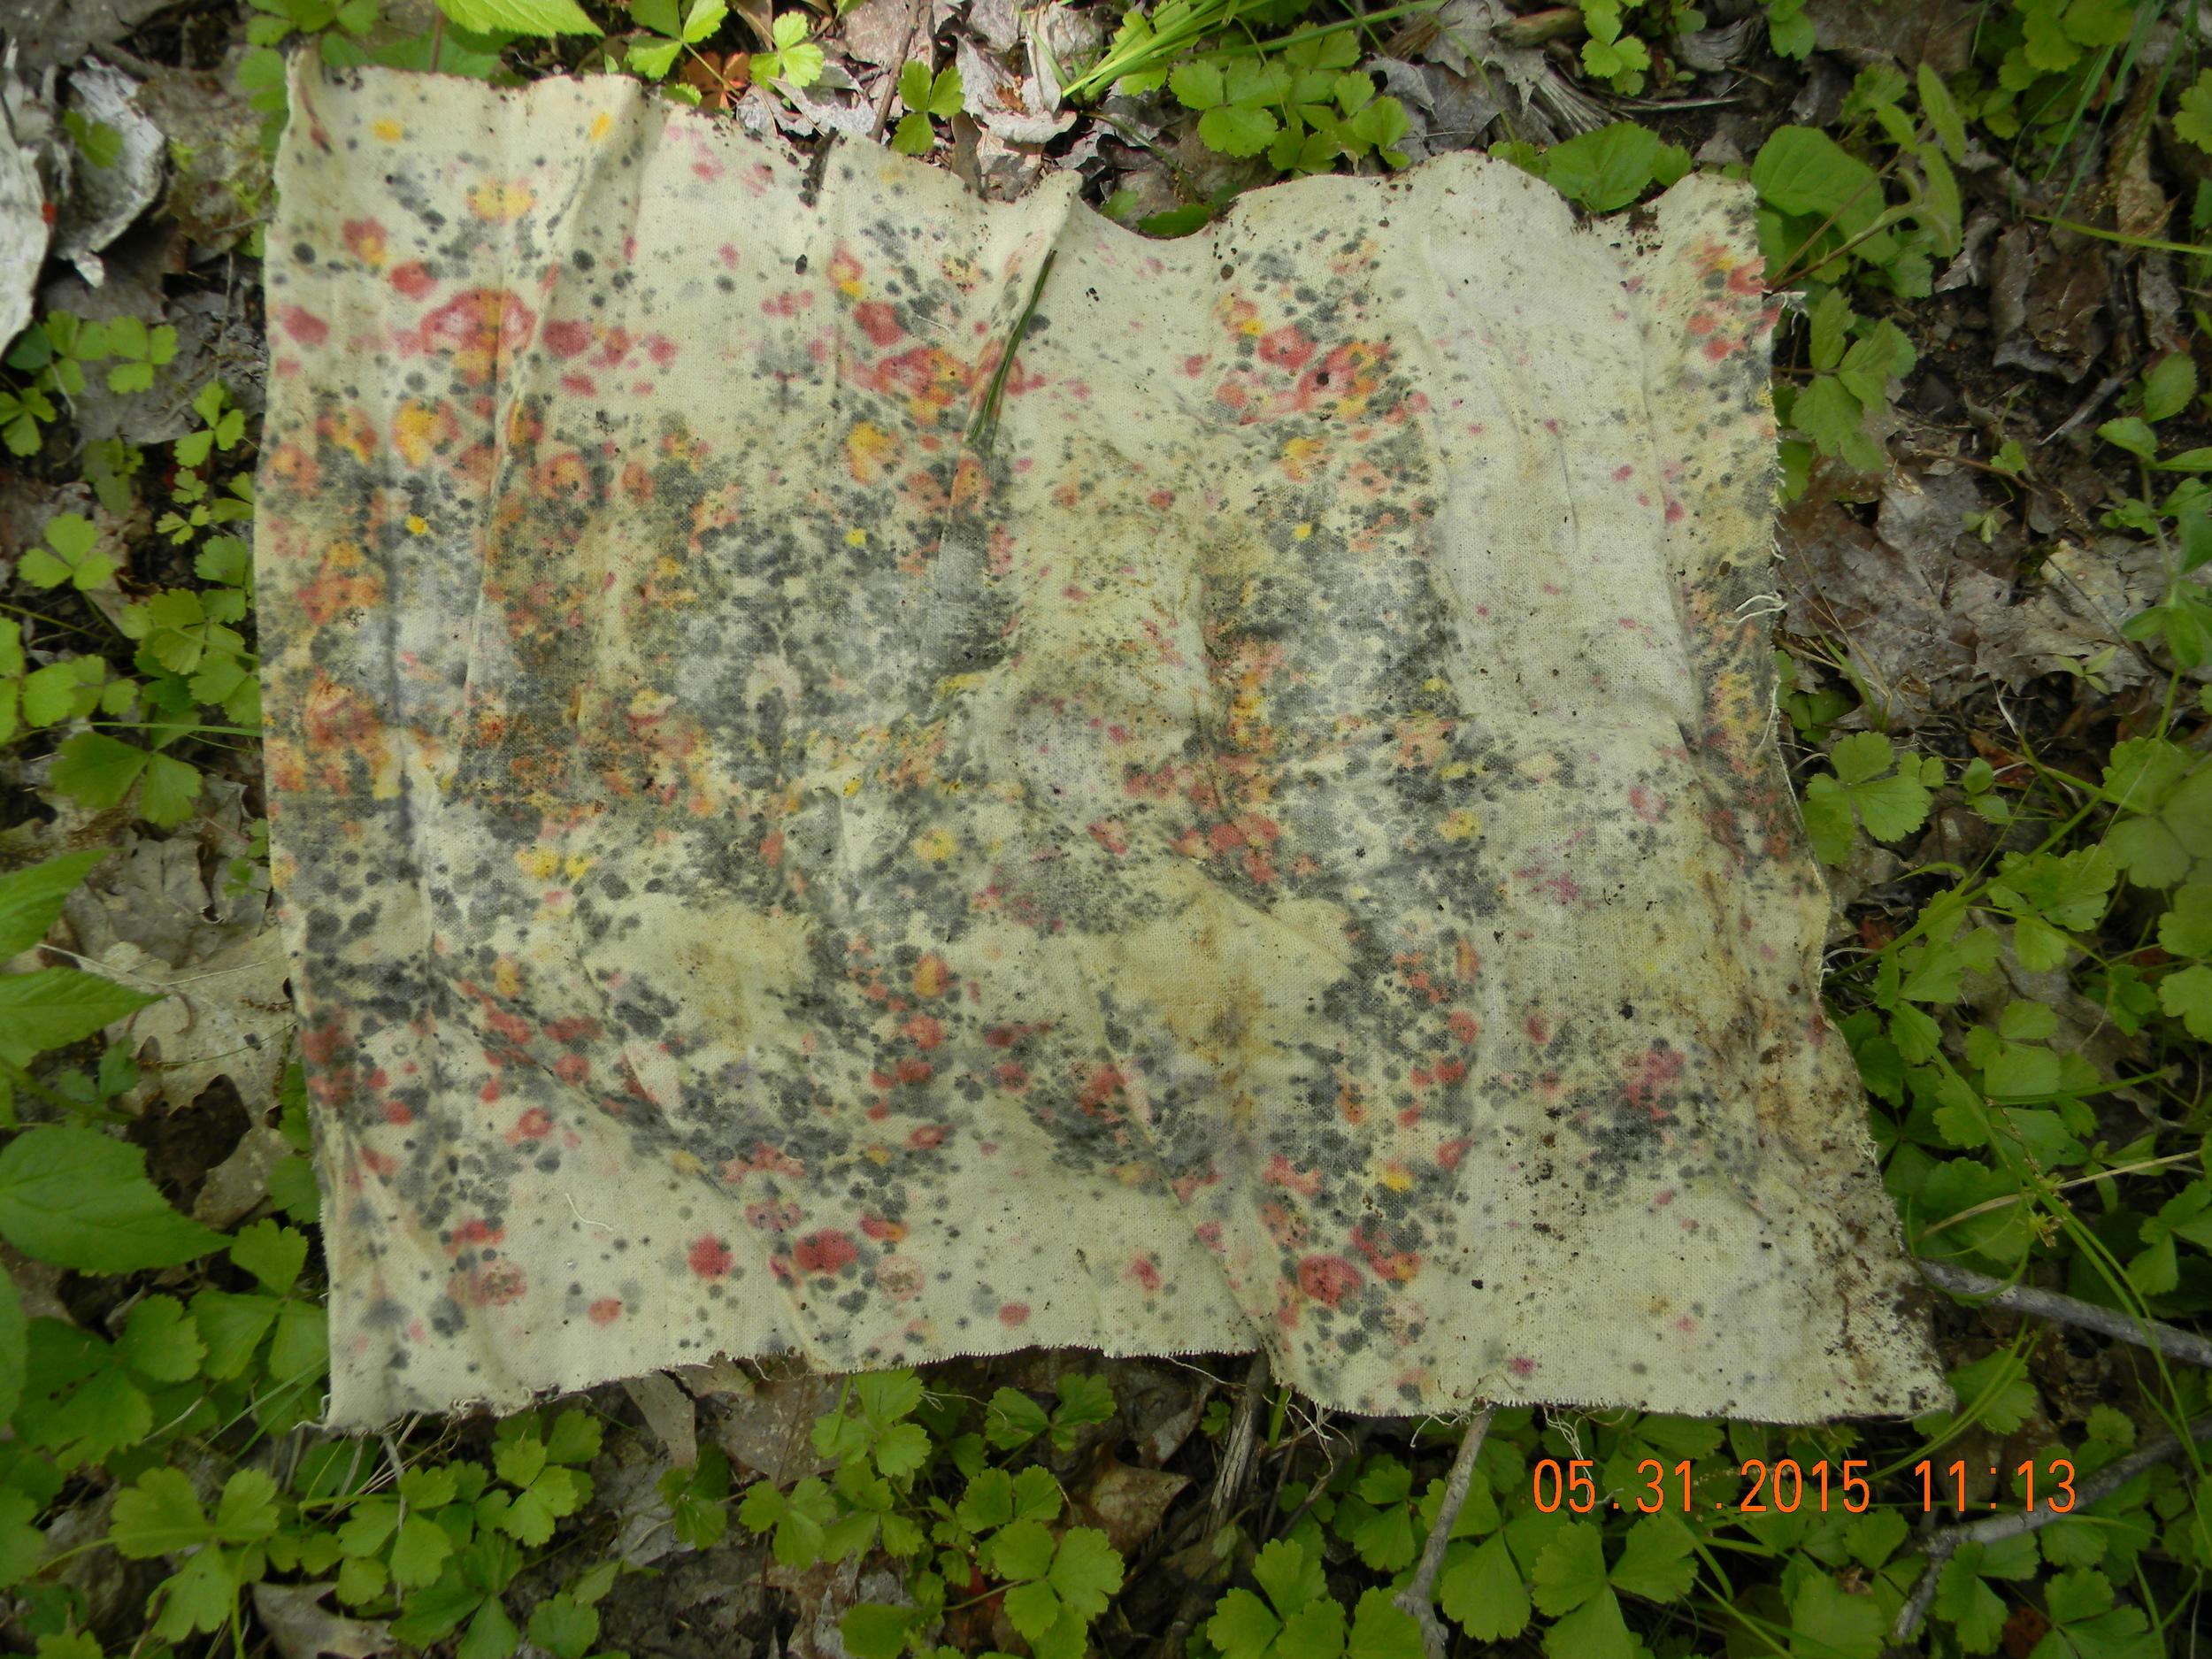 Soil quilt square from Berklund Family forest soil. Arbor Vitae, WI. Photo by Heather Berklund.